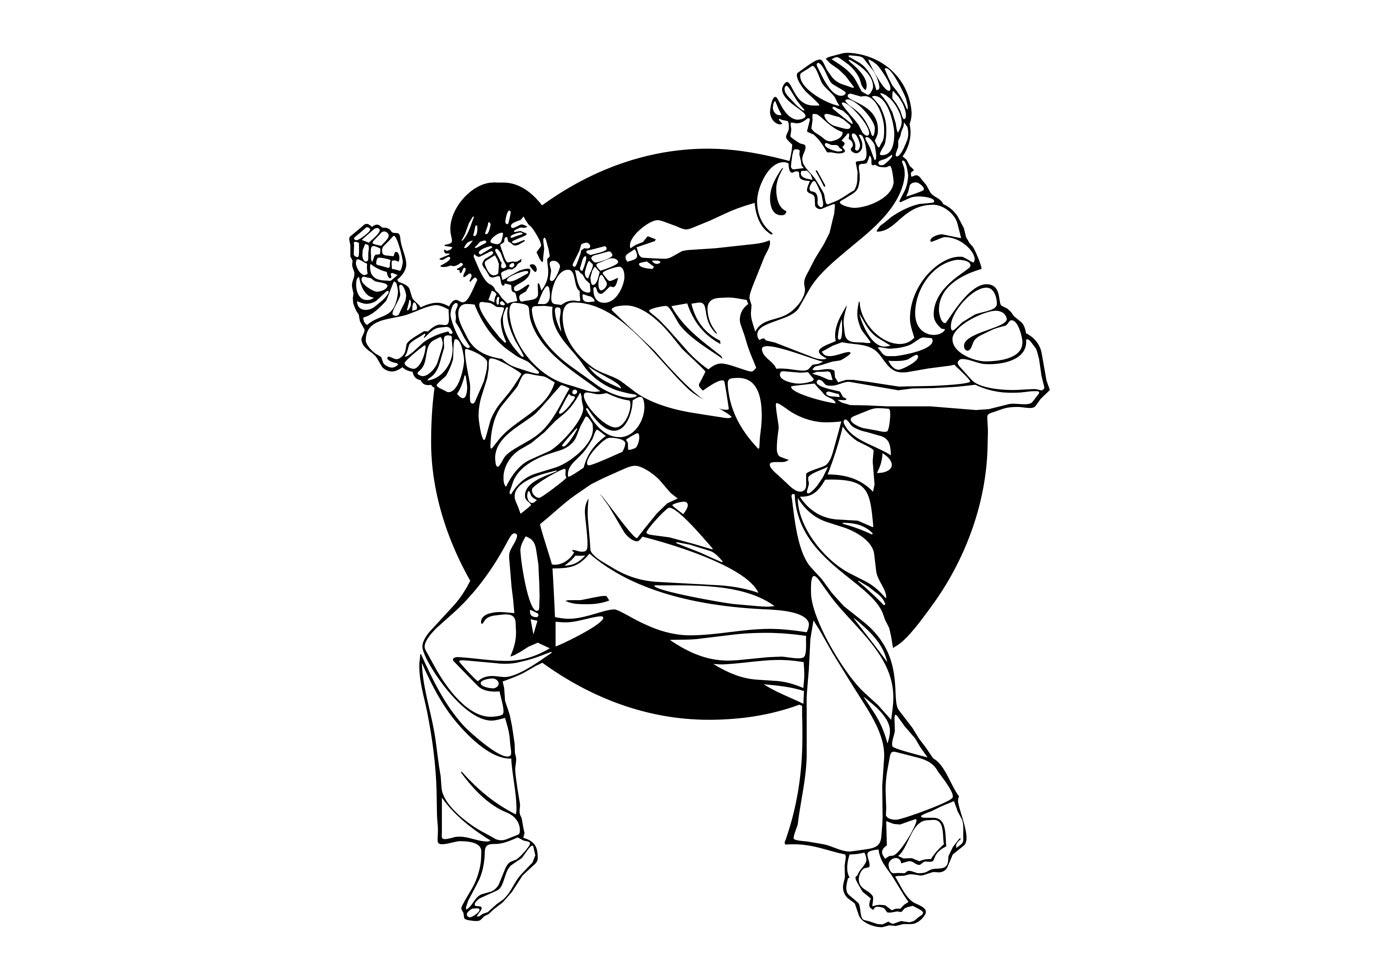 Karate Fight Graphics